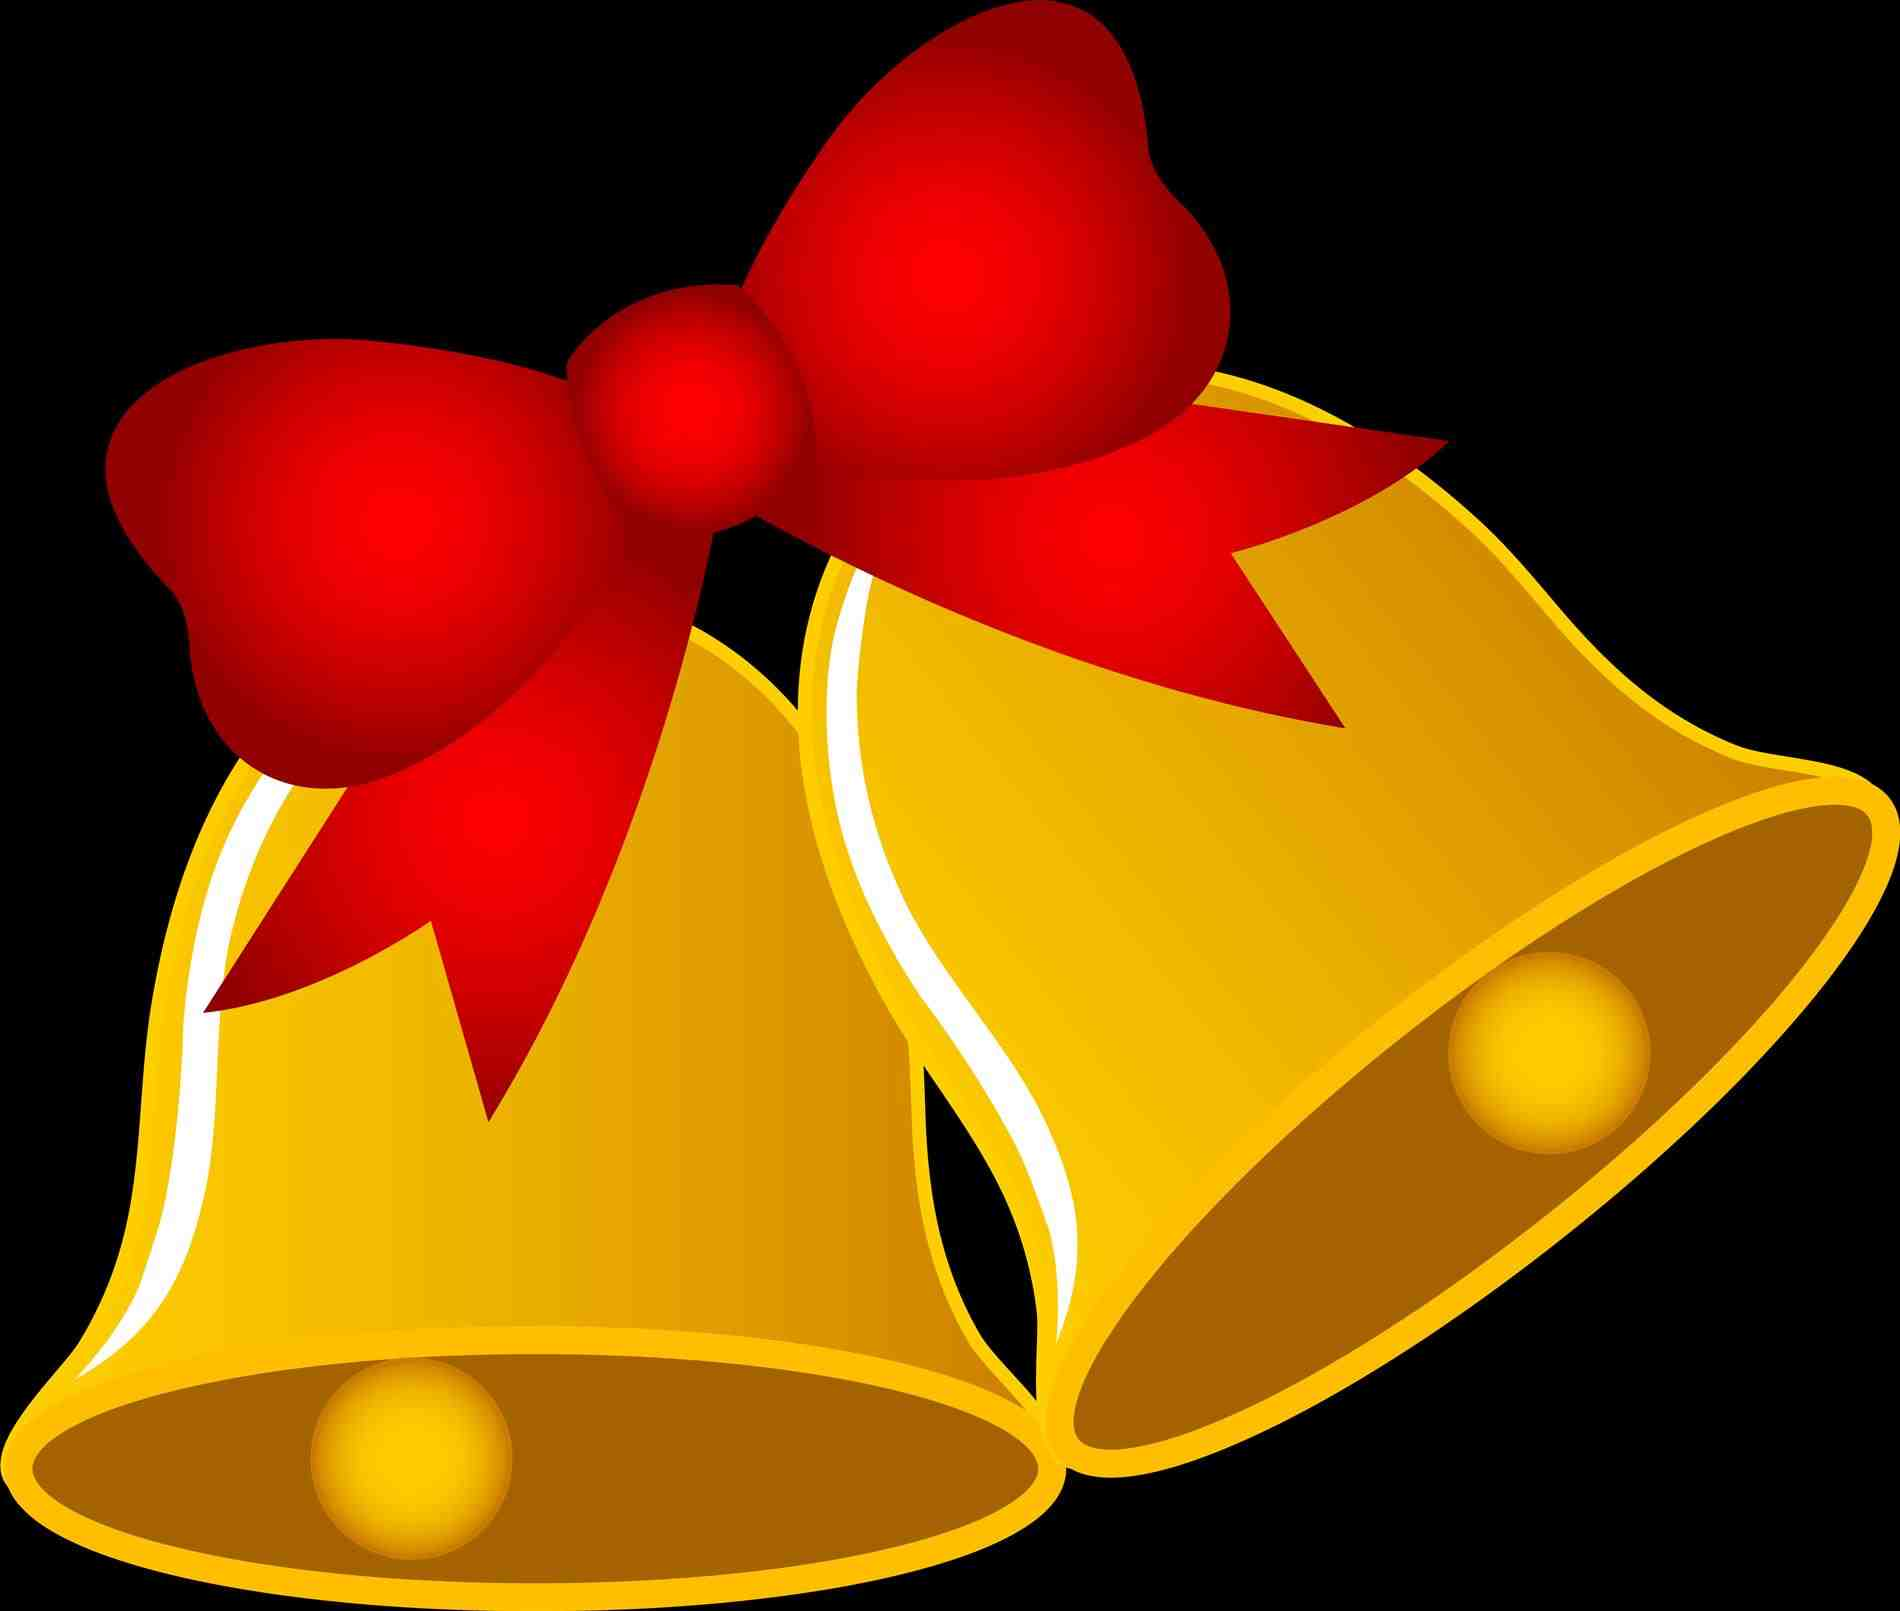 1900x1611 Gold Christmas Ornament Clip Art Cheminee.website